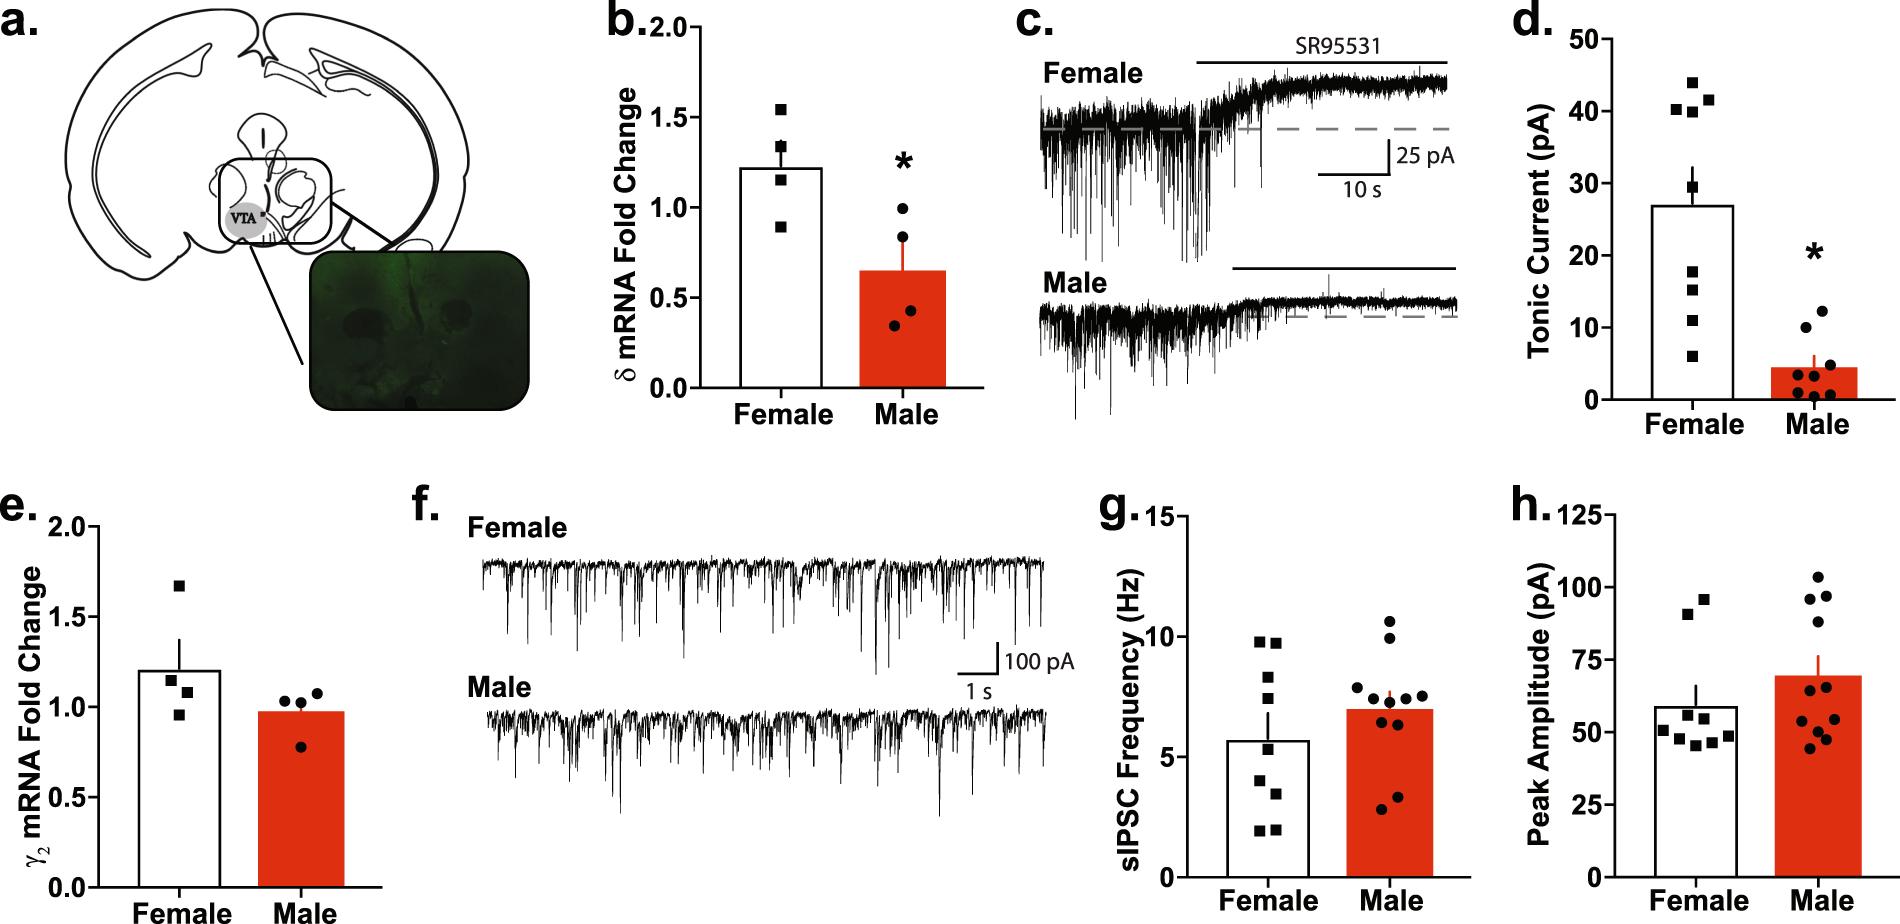 Female-specific decreases in alcohol binge-like drinking